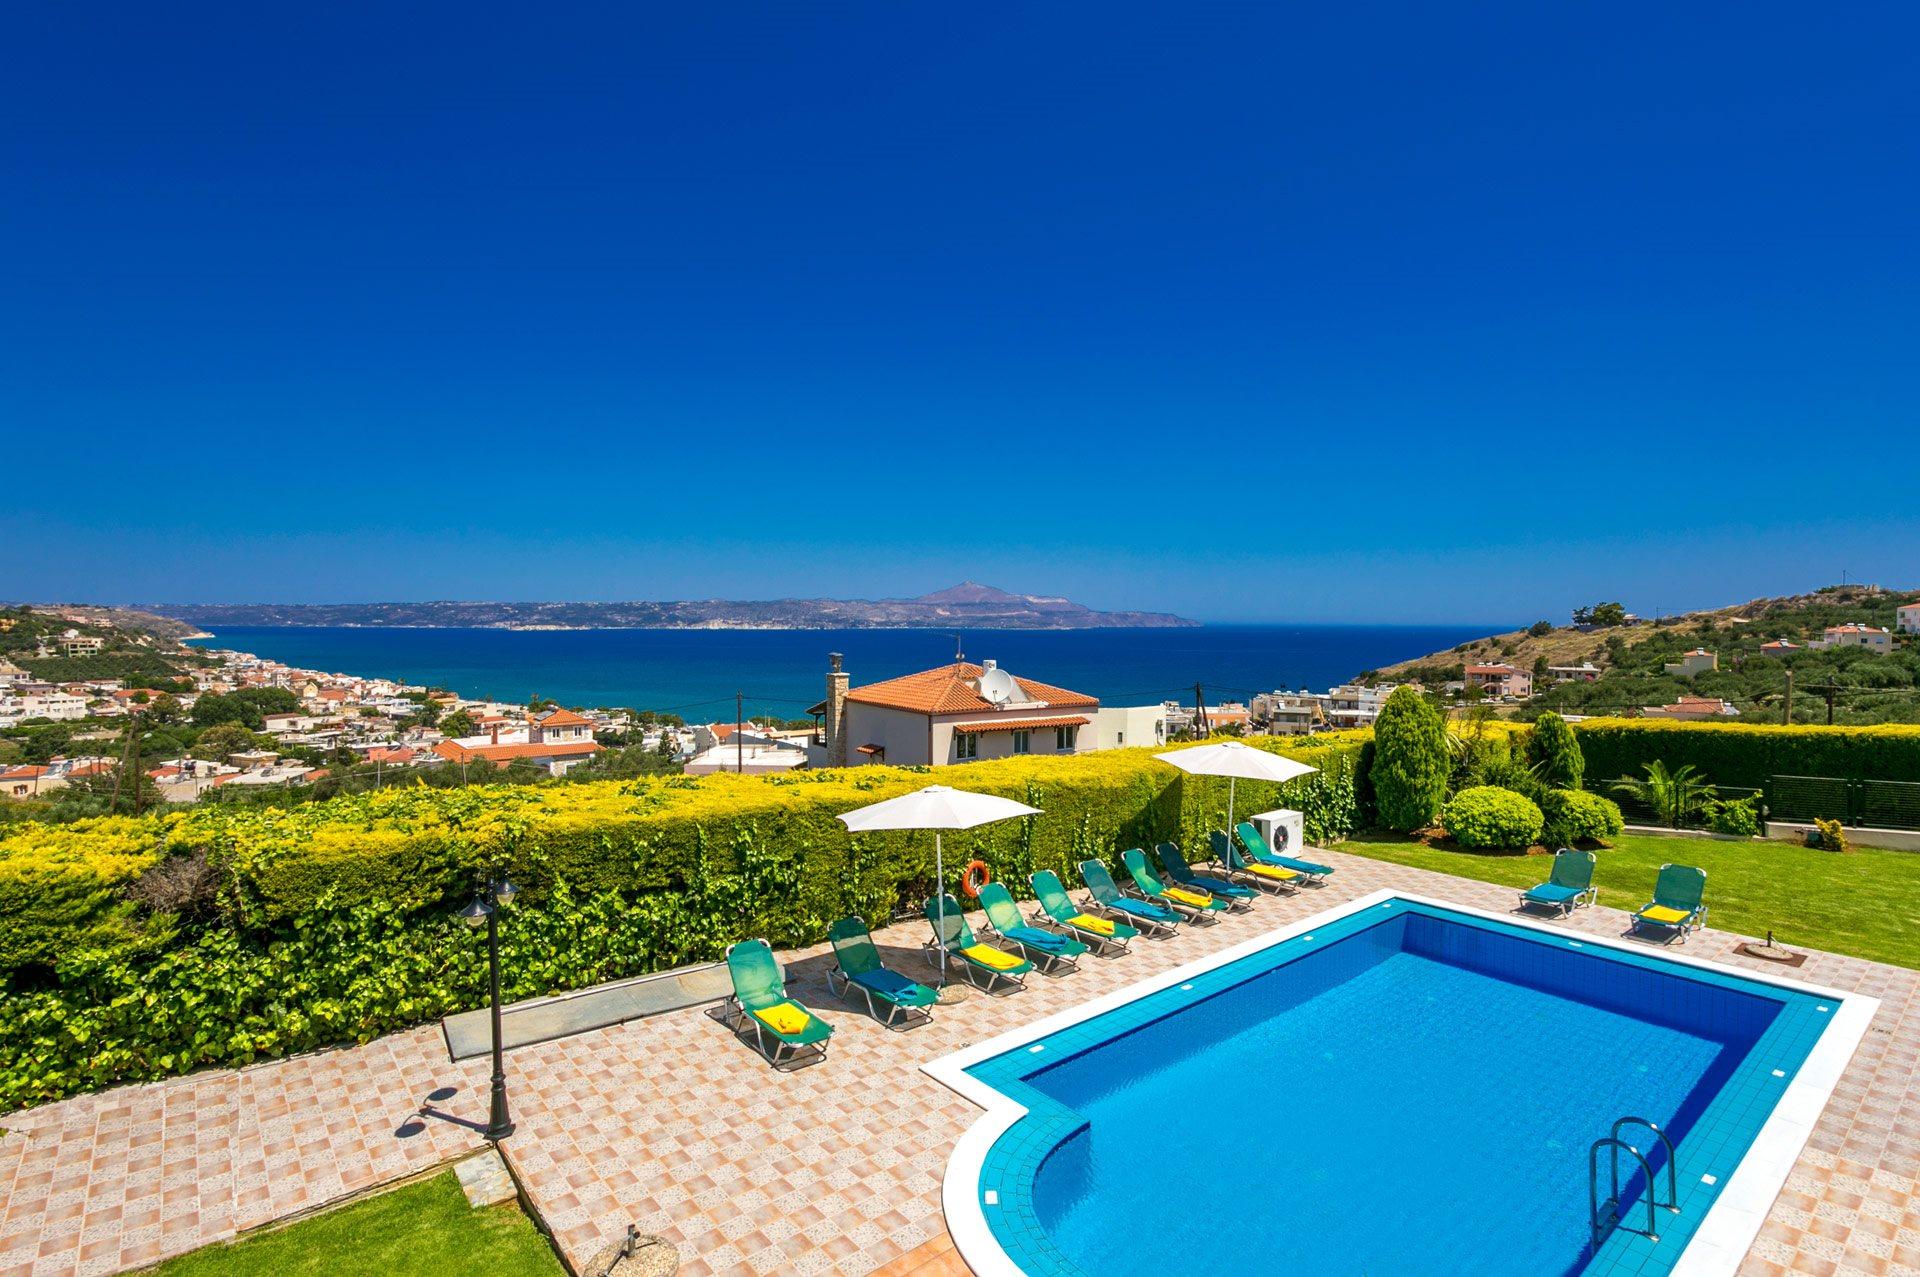 Villa Margarita Exi, Chania, Crete, Greece